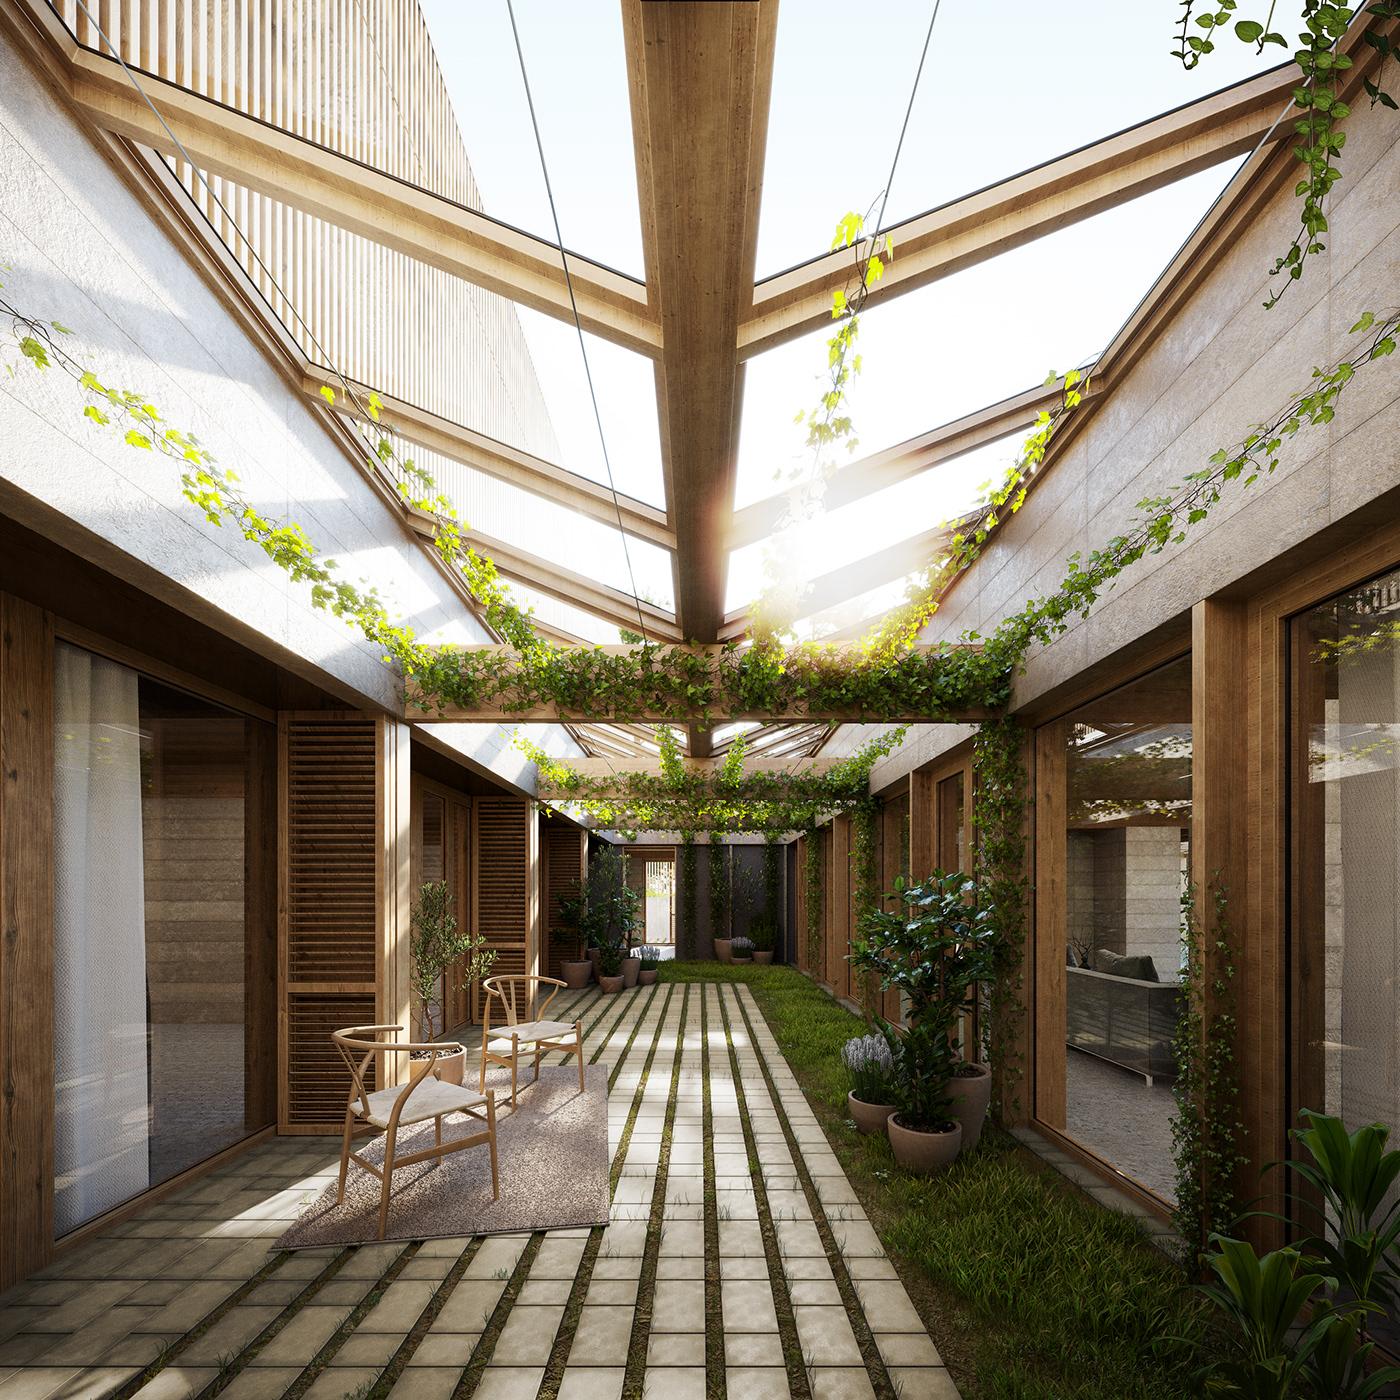 architecture archviz CGI Interior interiordesign Landscape Retail Urban